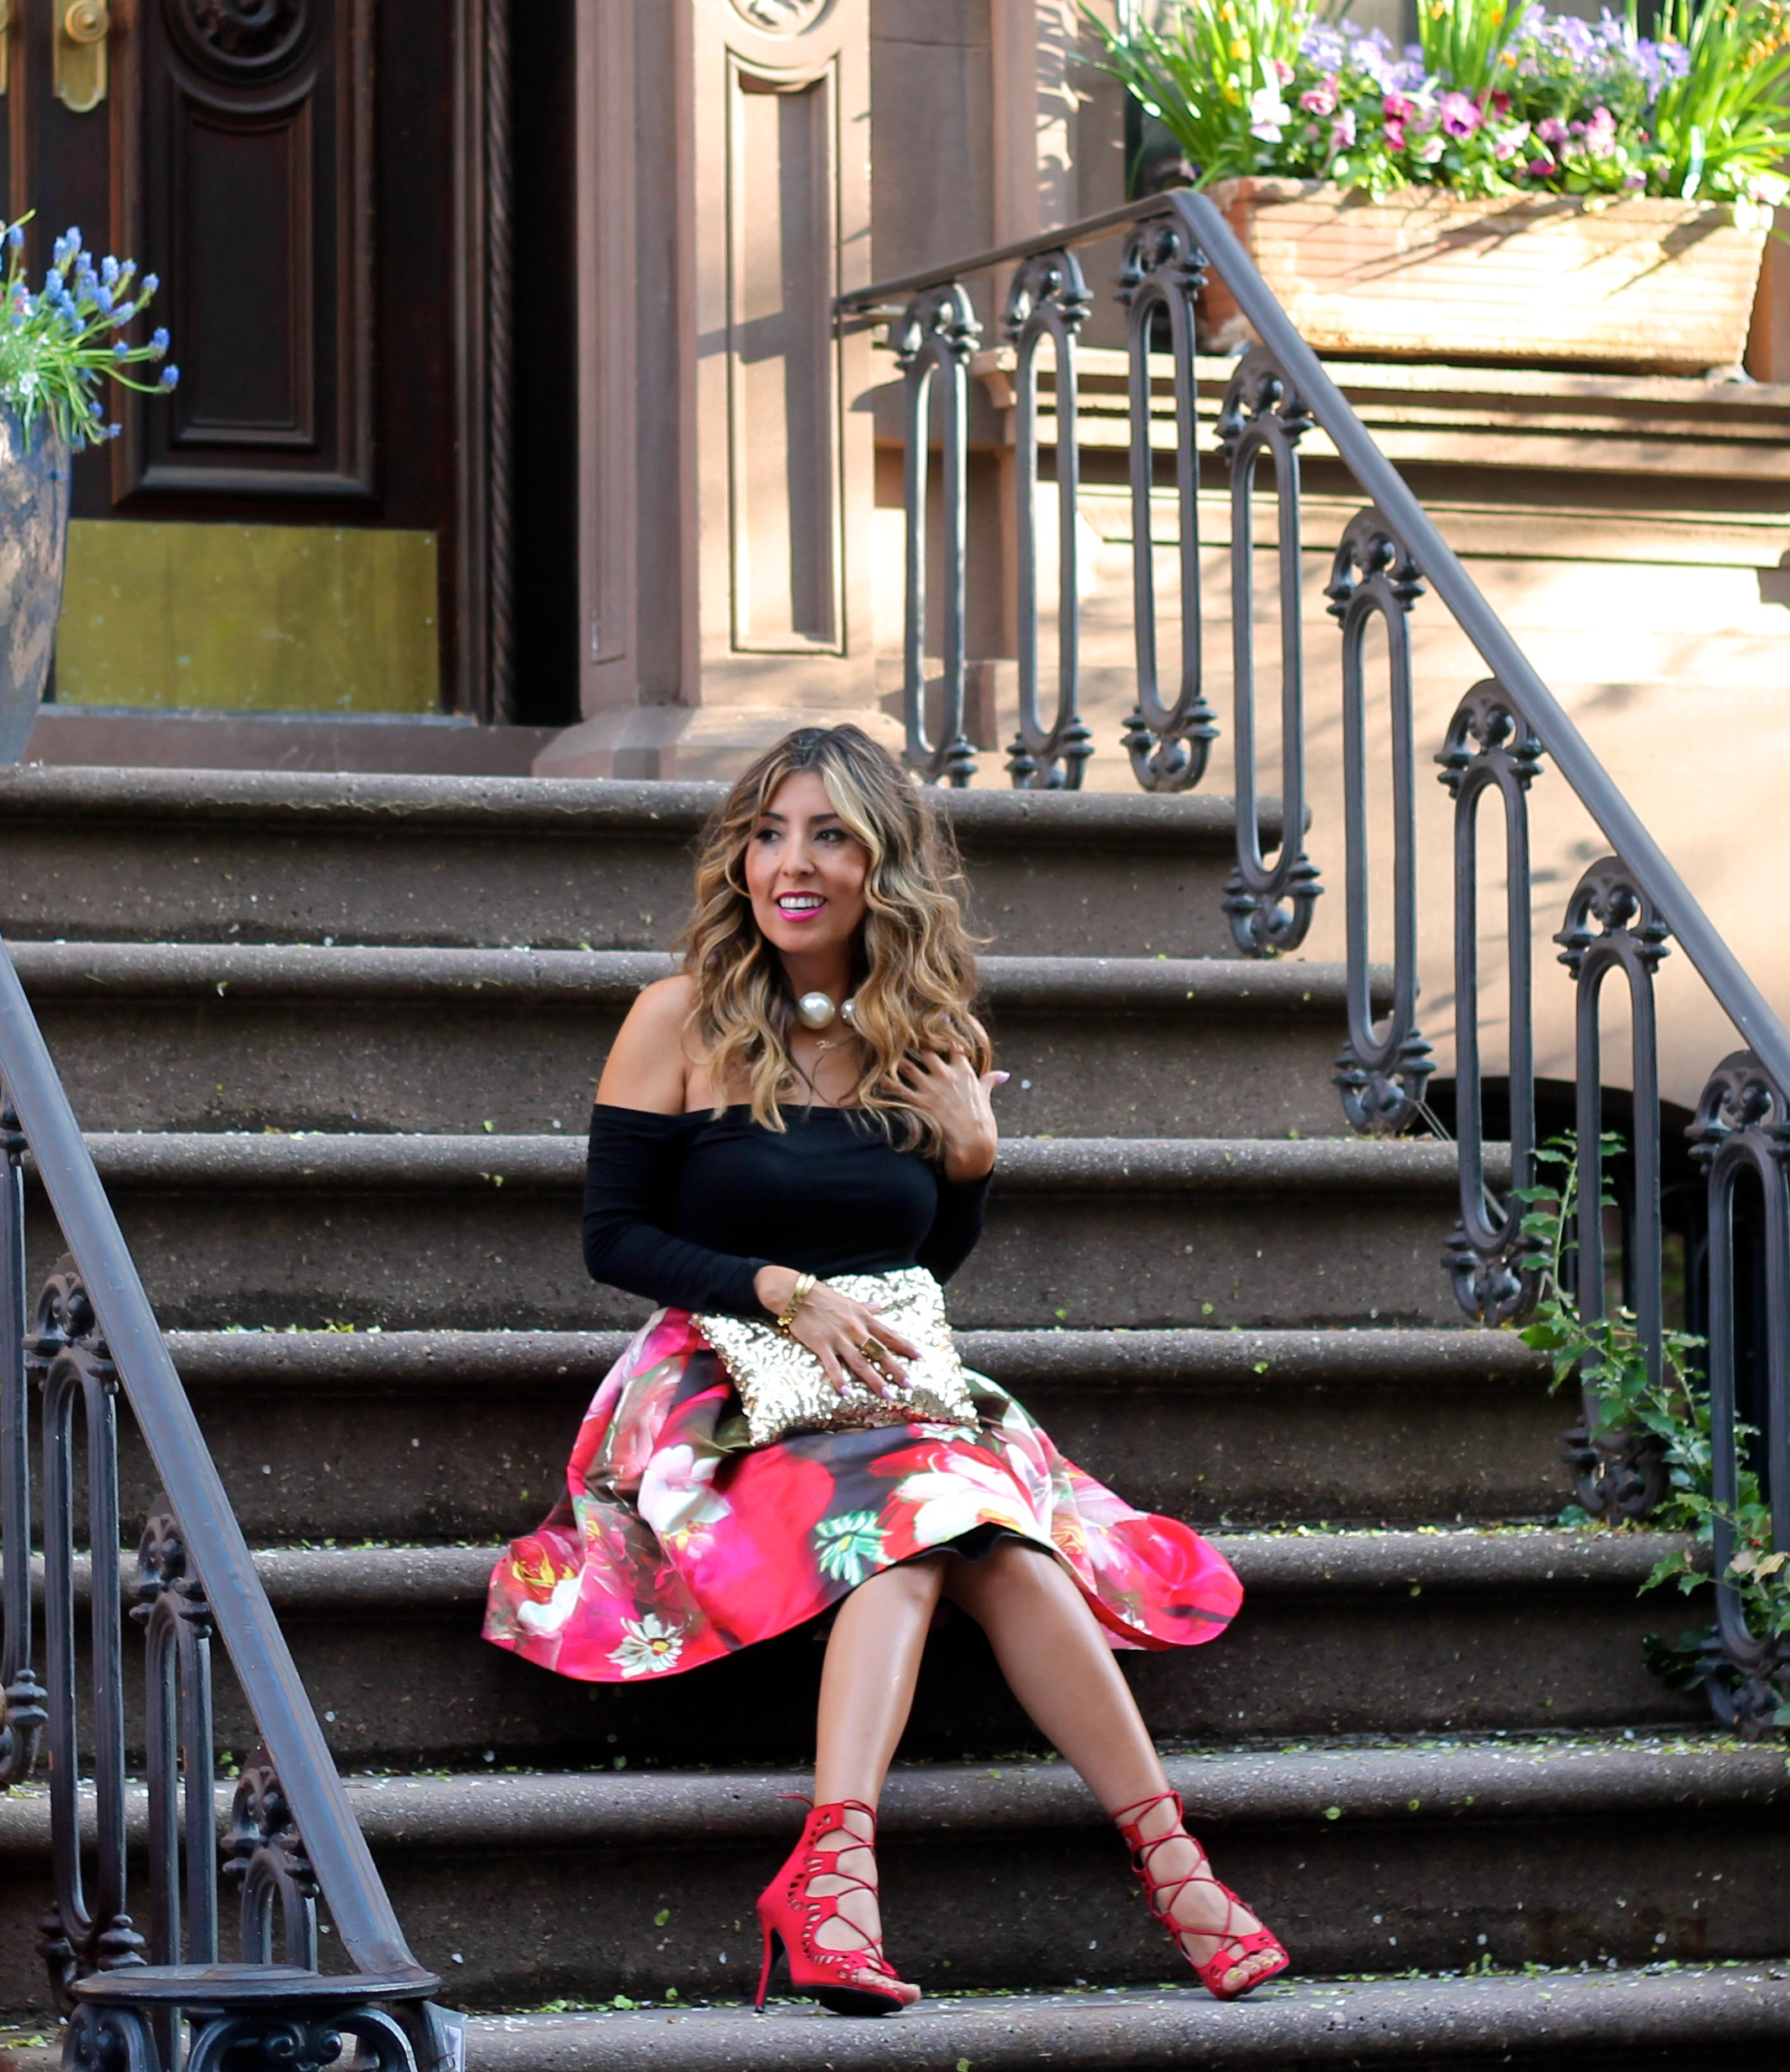 Carrie Bradshaw Apartment Address: Carrie Bradshaw's House